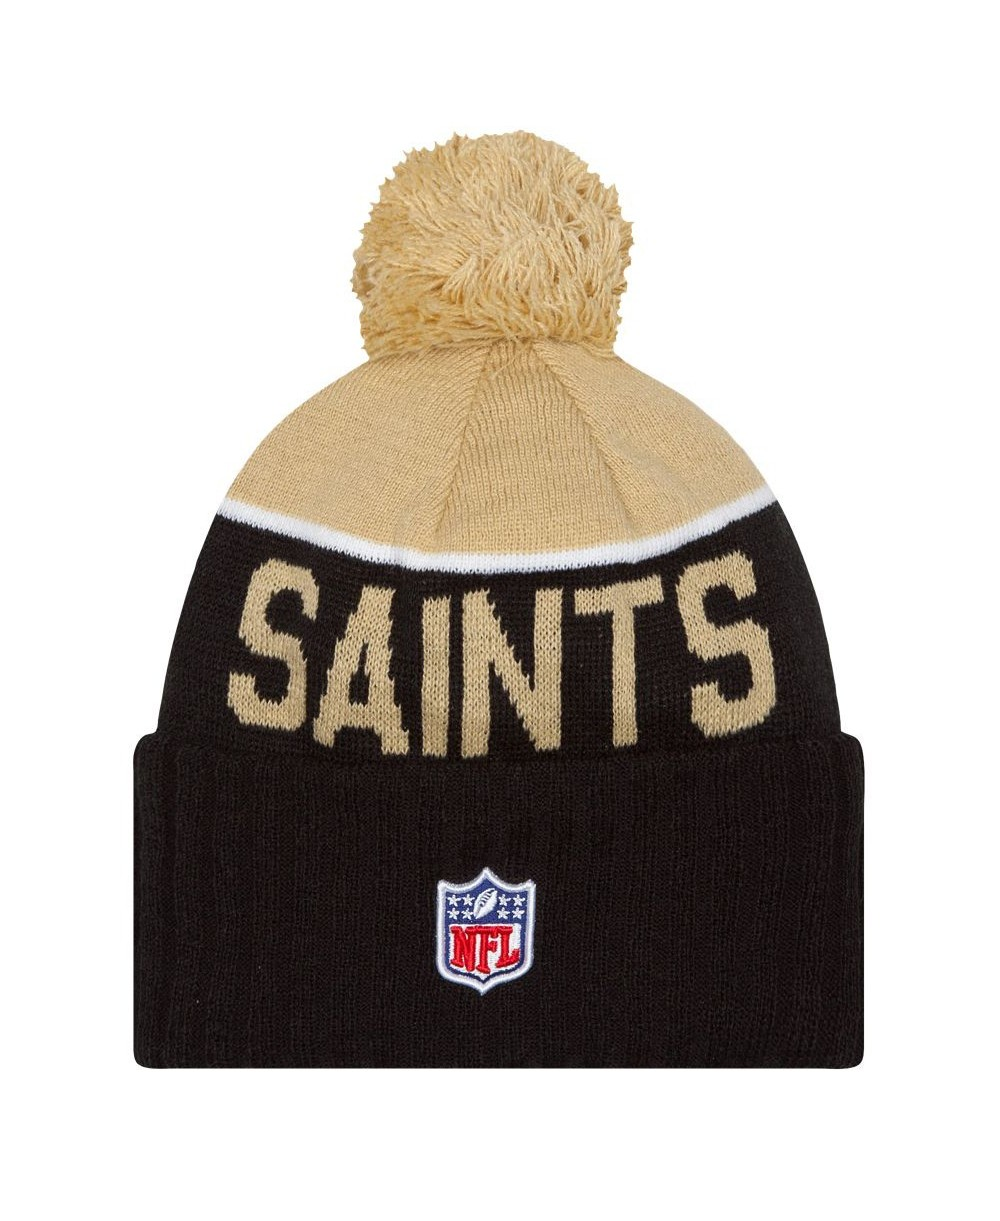 77f1f6346d8 New Era Men s Beanie NFL Sideline New Orleans Saints